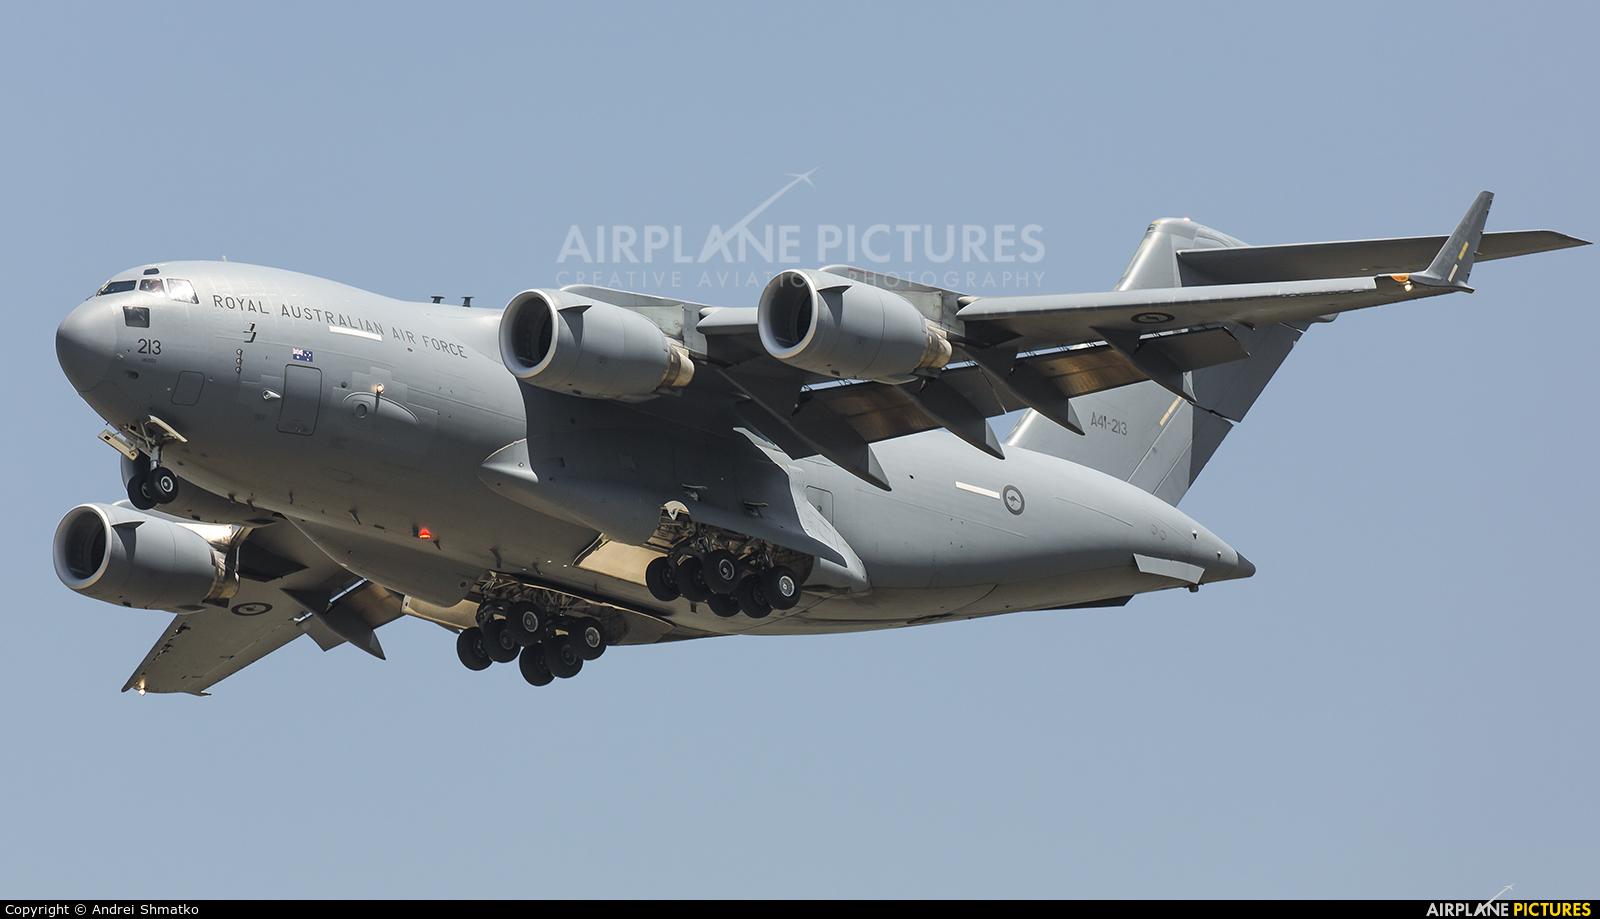 Australia - Air Force A41-213 aircraft at Osan AB